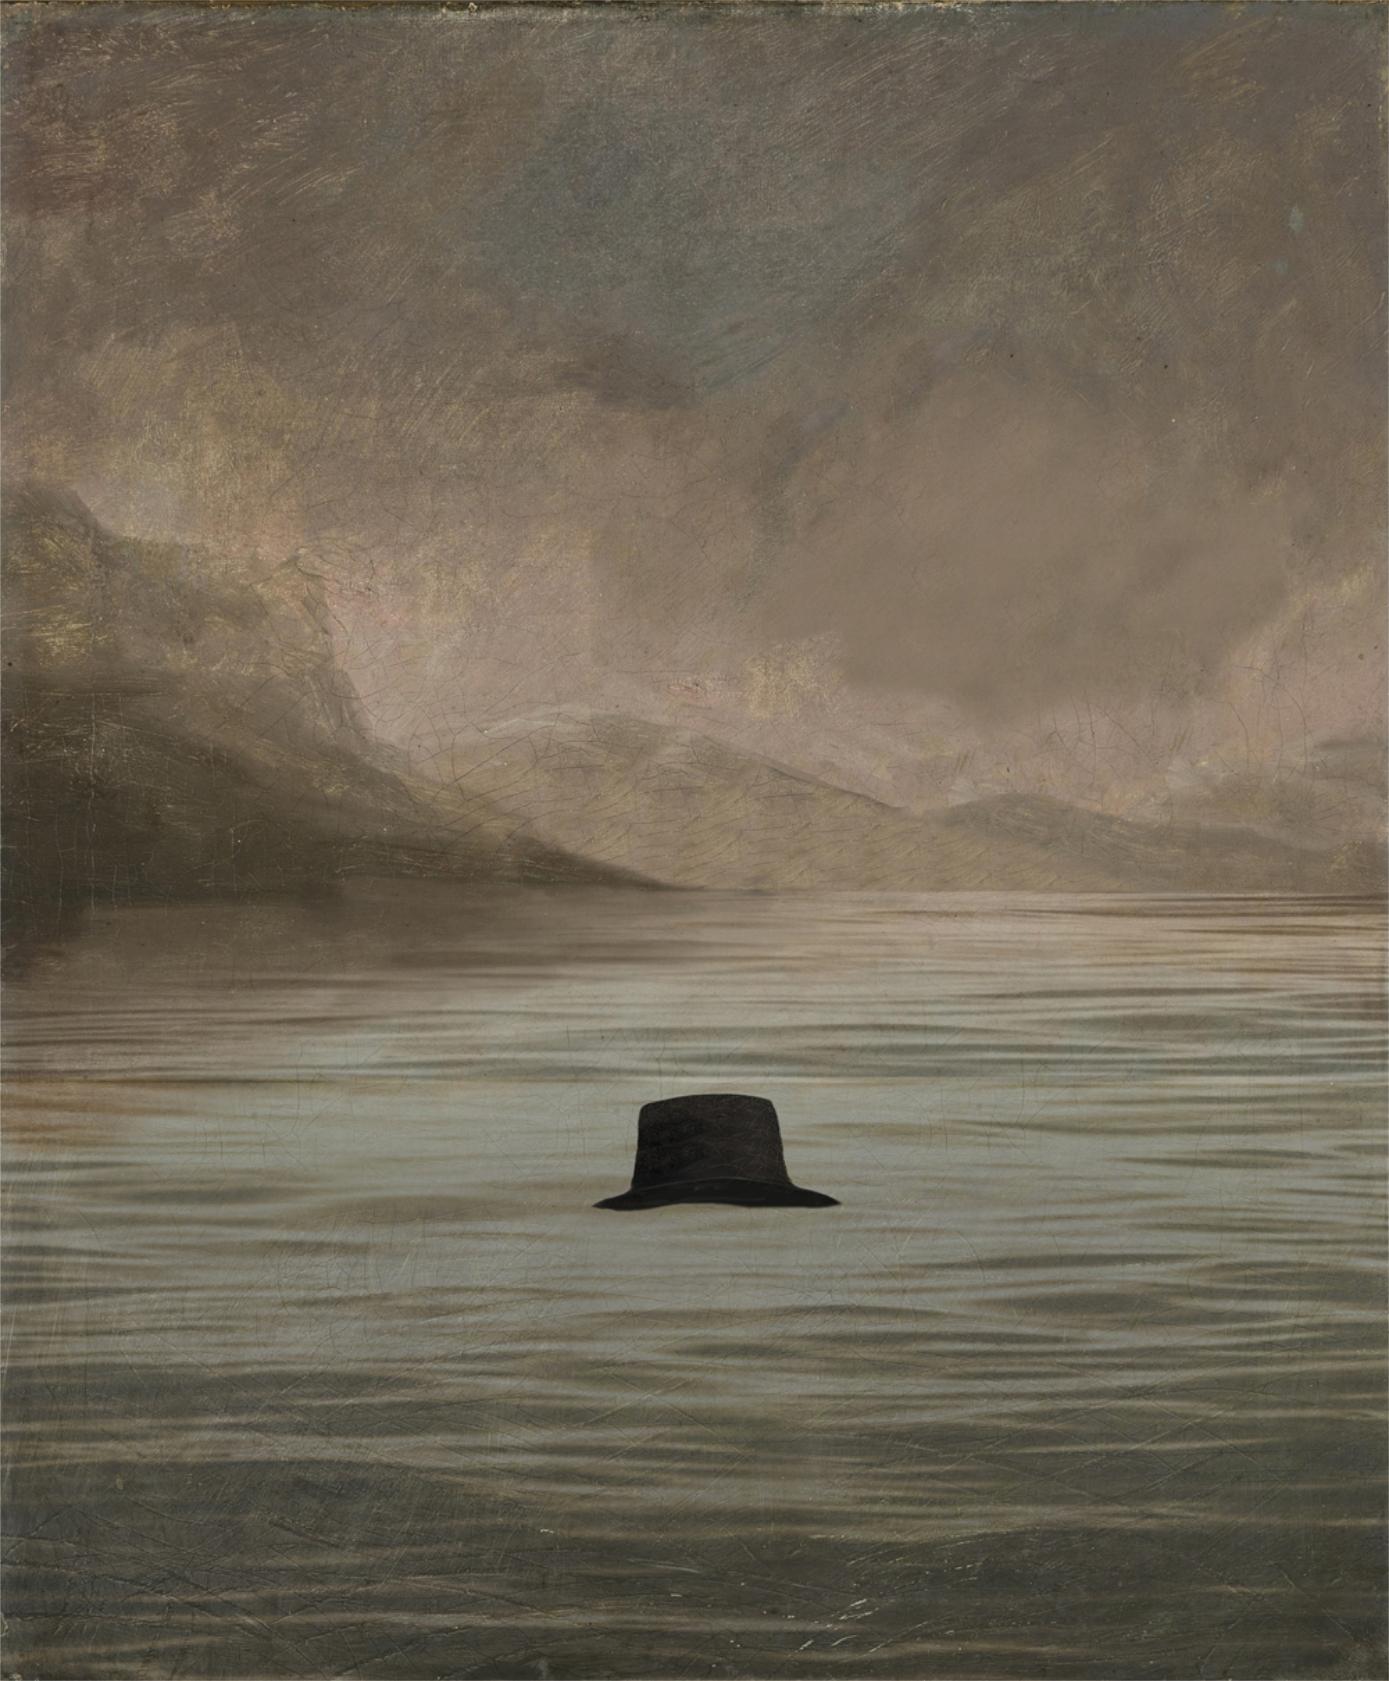 Reverend Robert Walker's hat floating in the same spot on the loch.